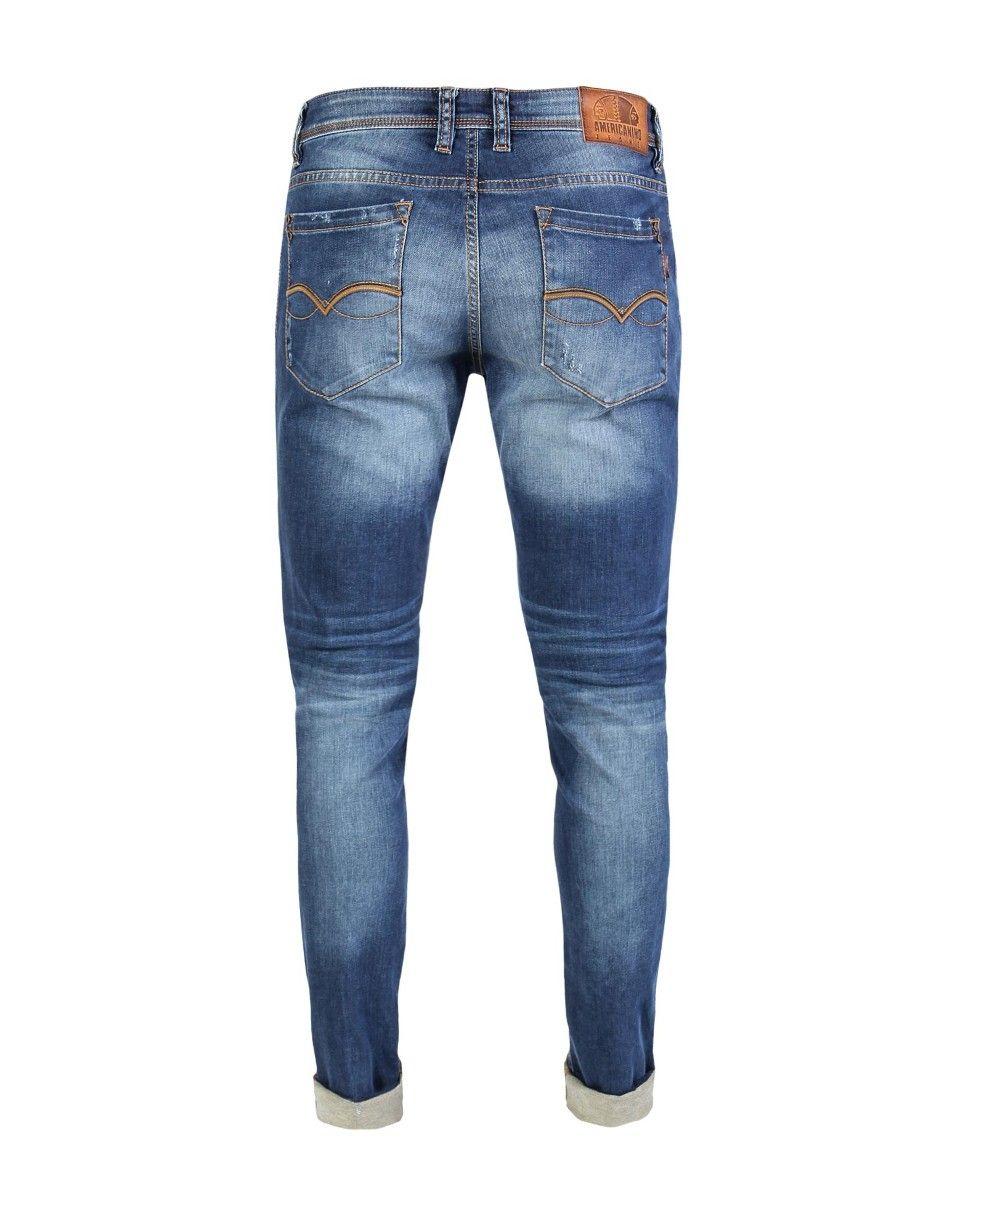 9916ba13 Jean 5336701 - americanino   DENIM en 2019   Pantalones jean ...